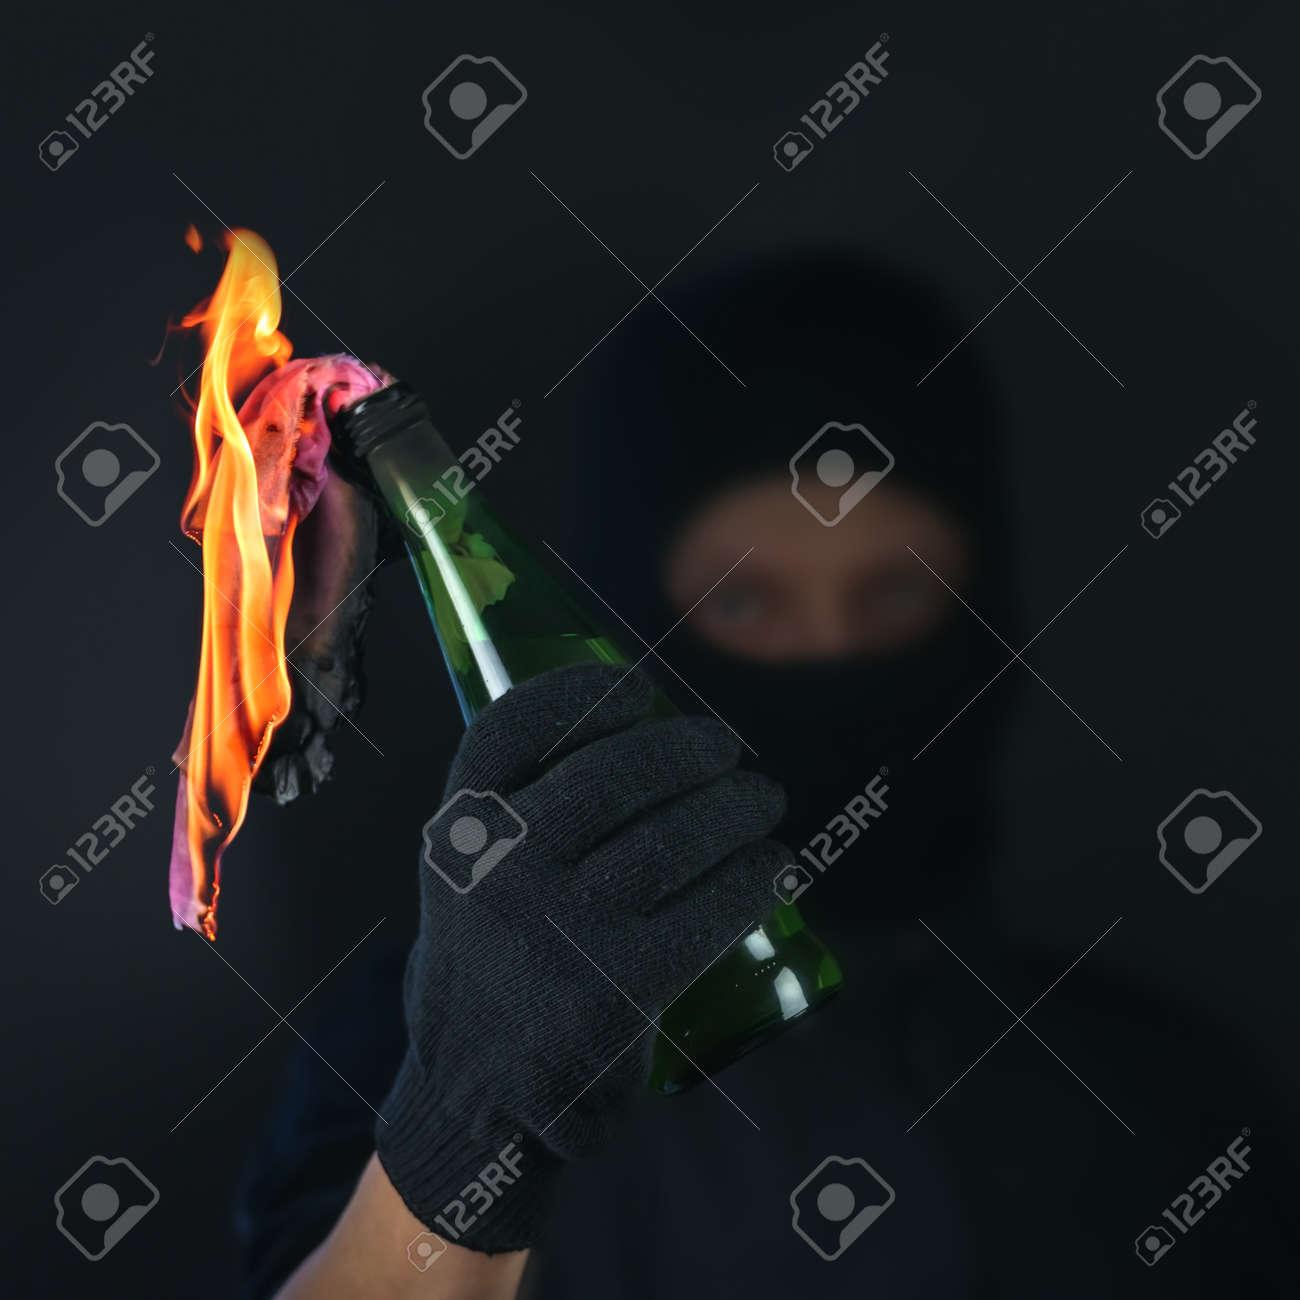 molotov cocktail in activist hand Stock Photo - 26119454